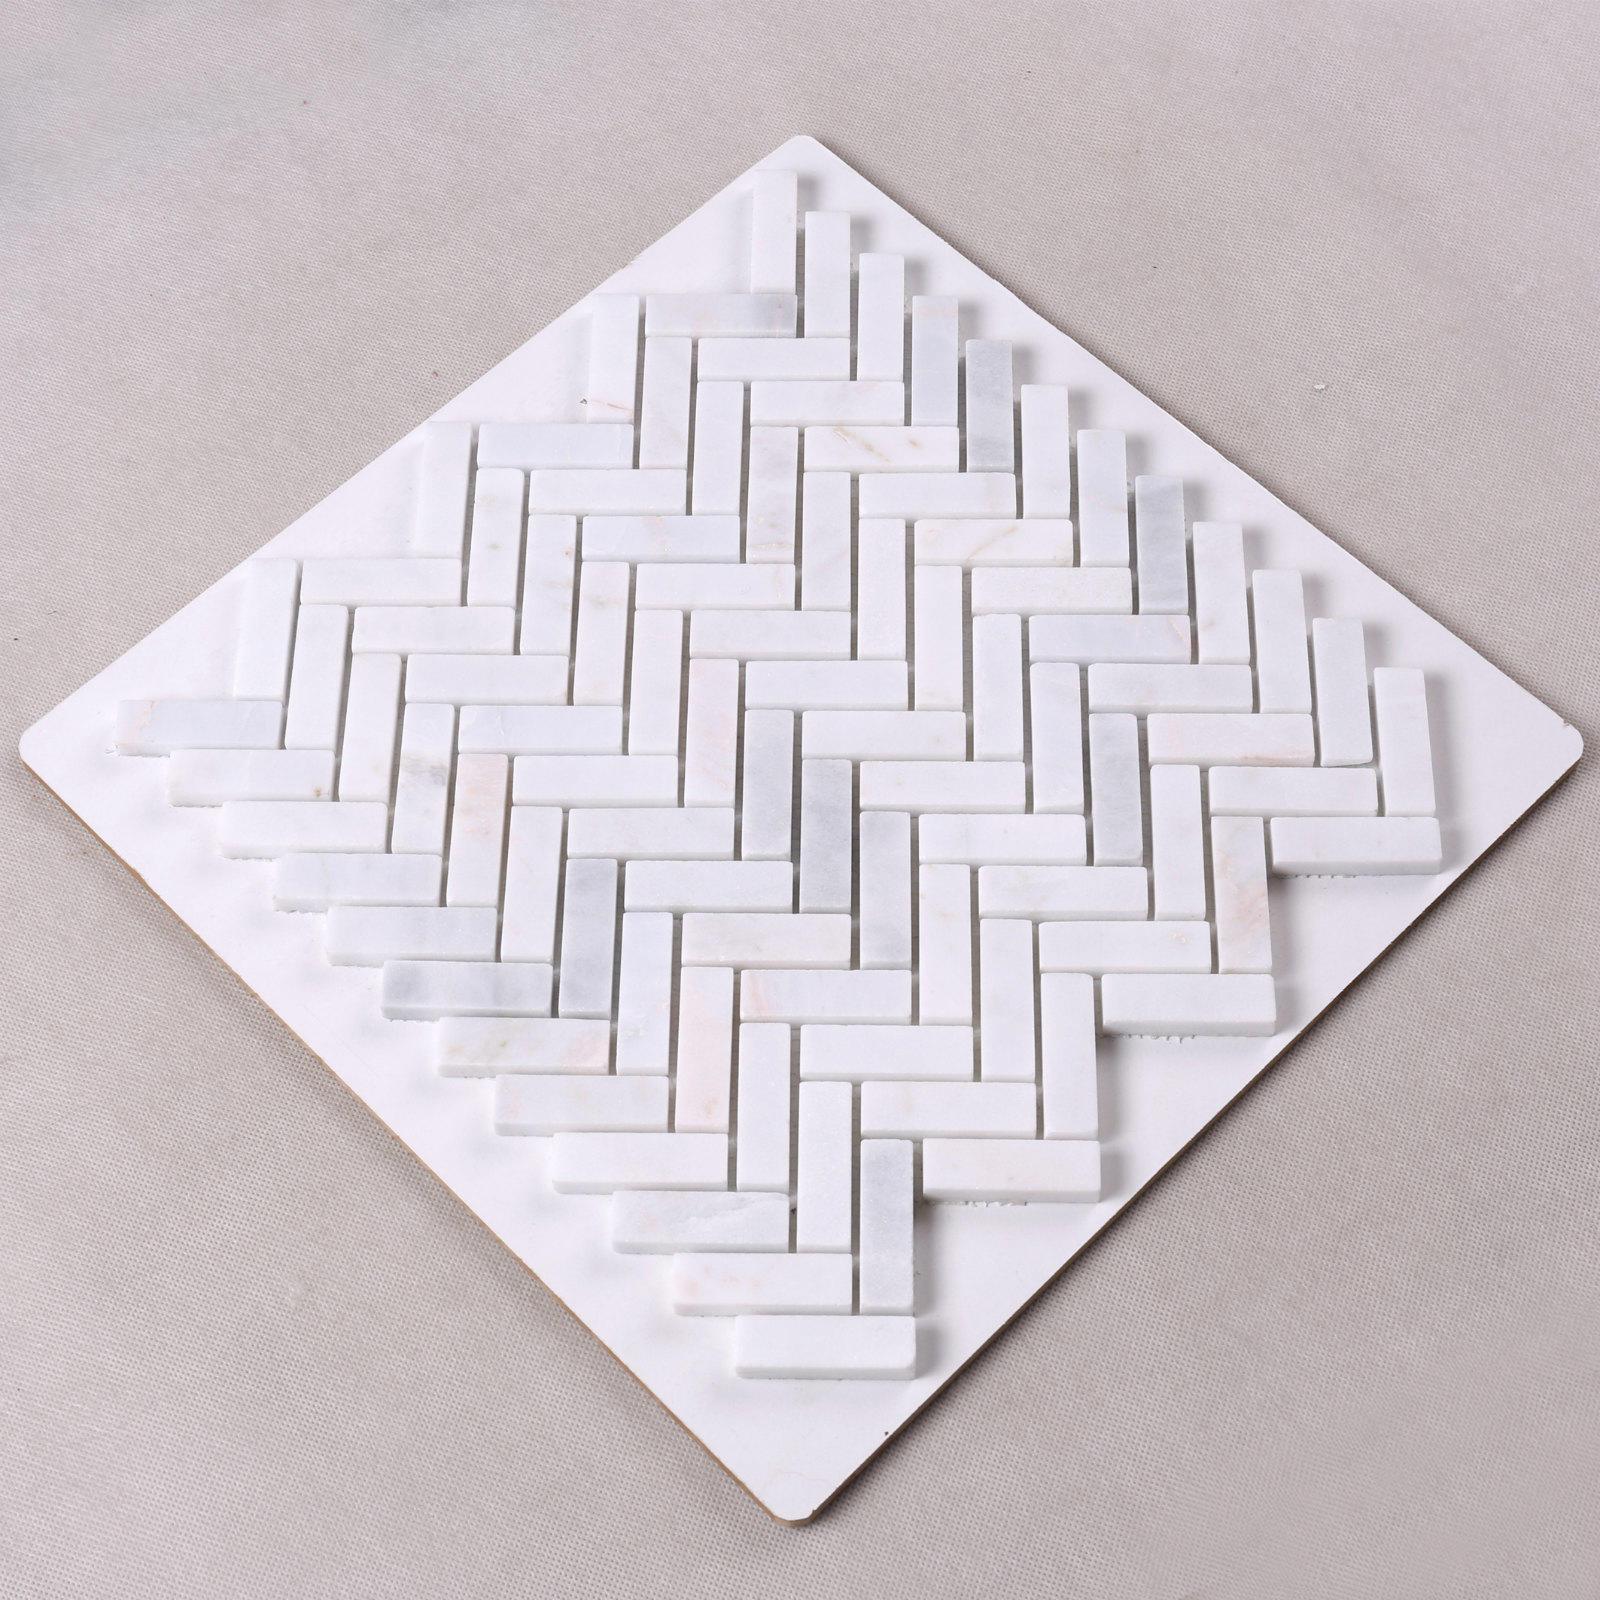 Heng Xing-stone tile ,natural stone mosaic tile sheets | Heng Xing-1